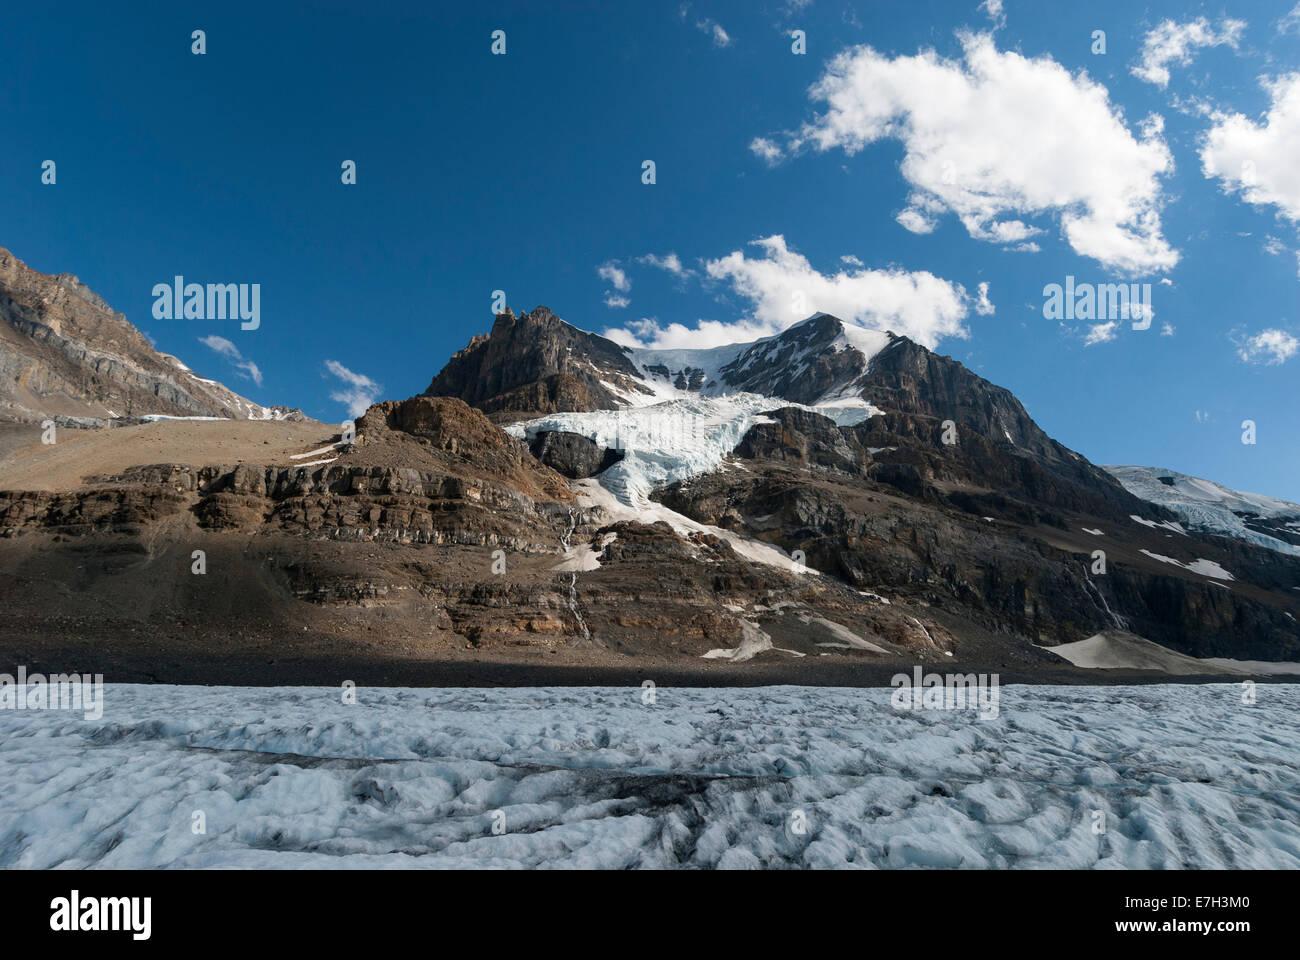 Elk203-7445 Canada, Alberta, Jasper National Park, Columbia Icefield, Athabasca Glacier - Stock Image